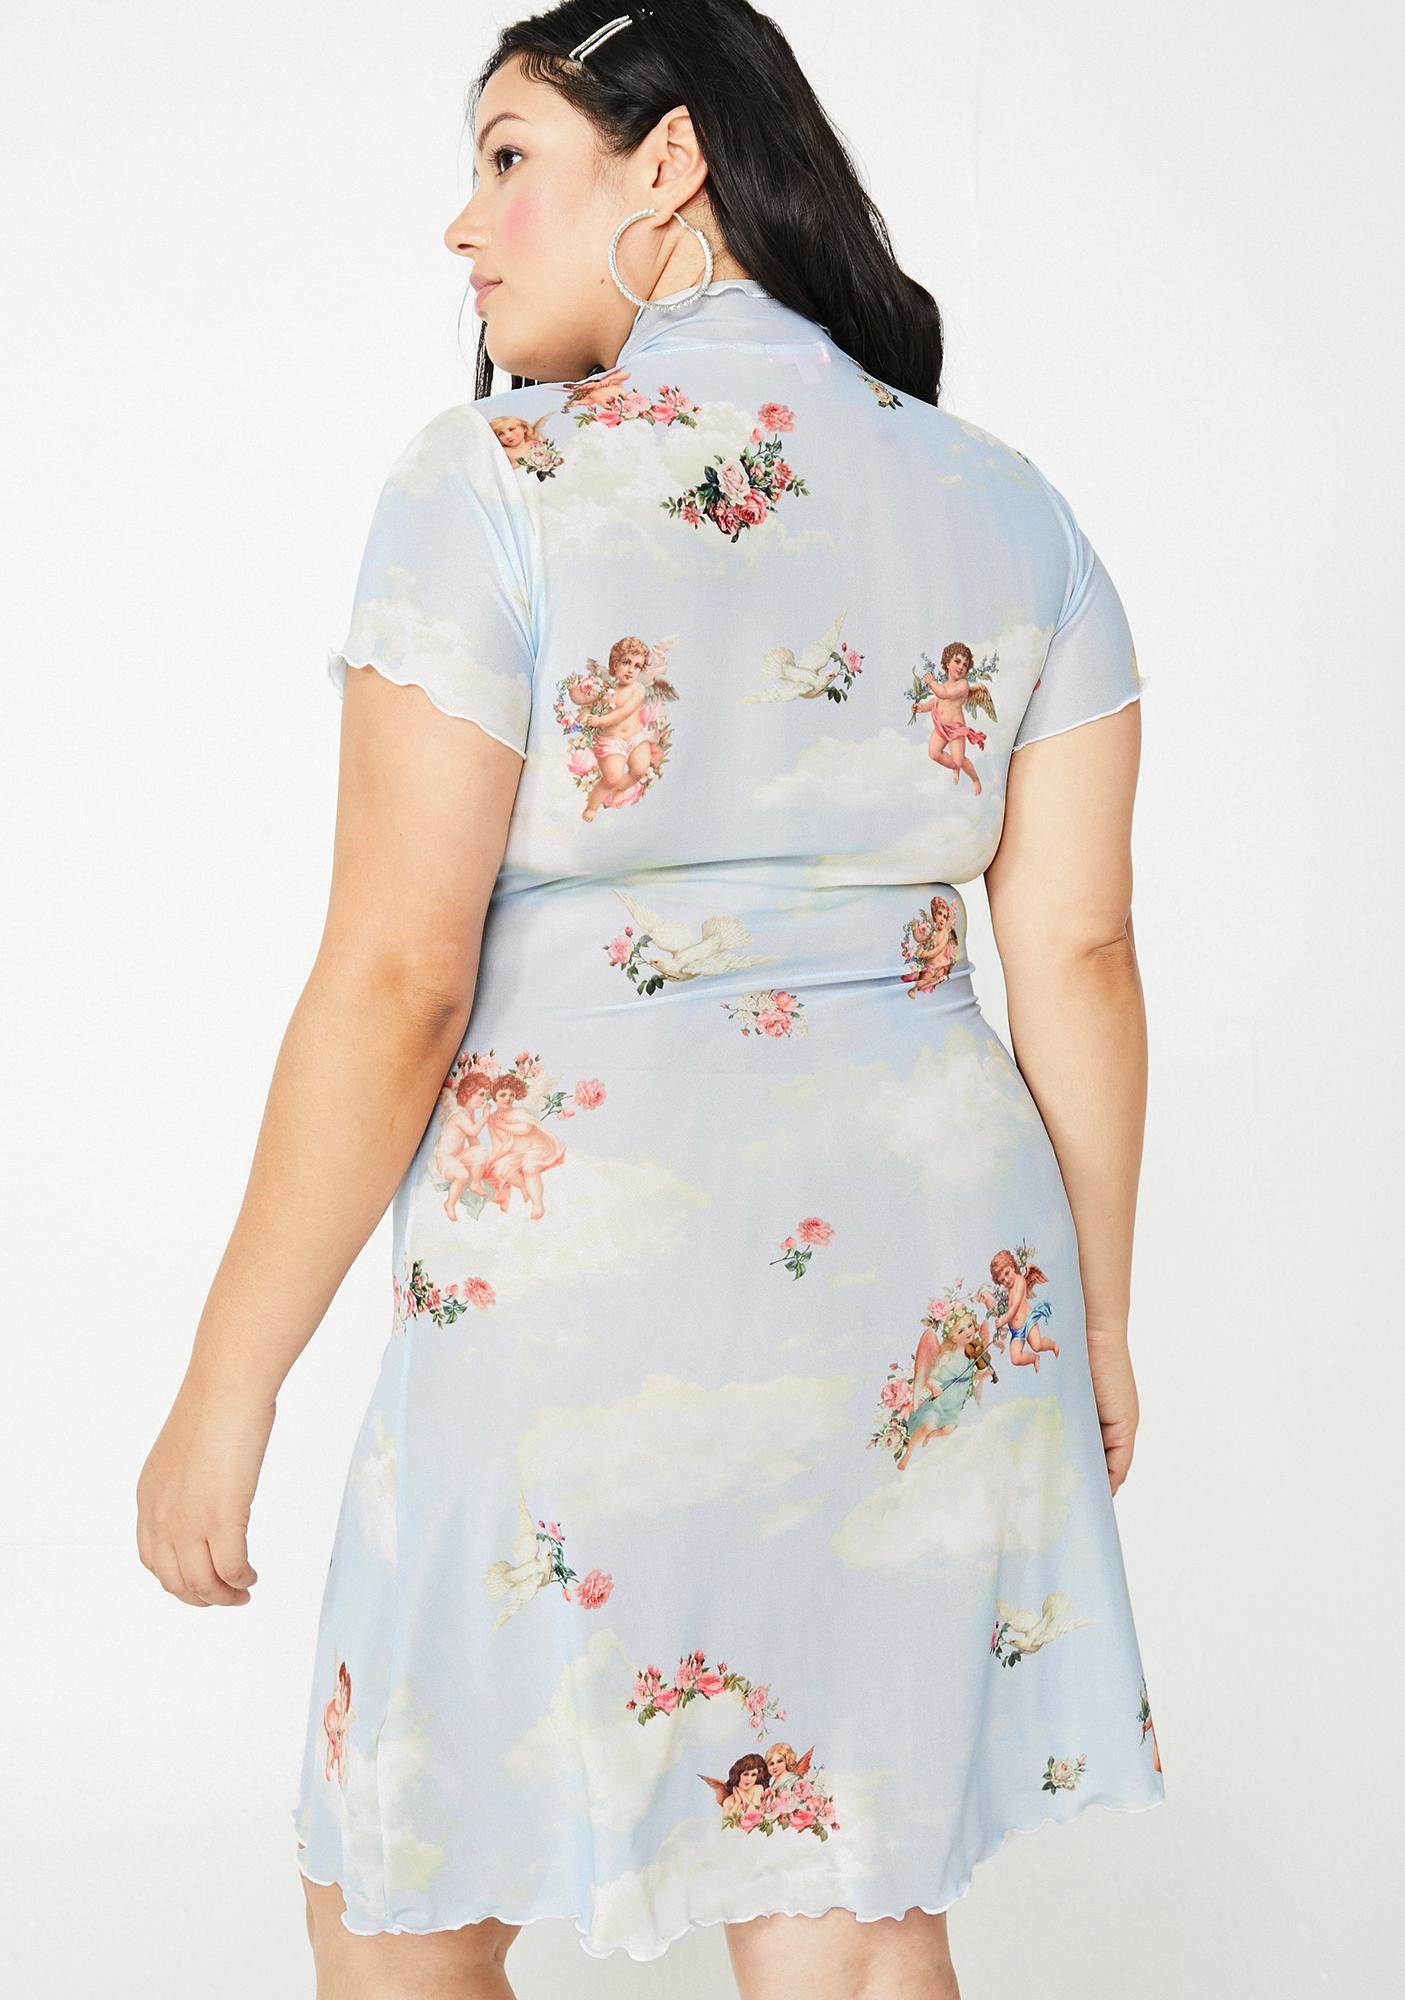 Sugar Thrillz Miss Celestial Sass Mesh Dress